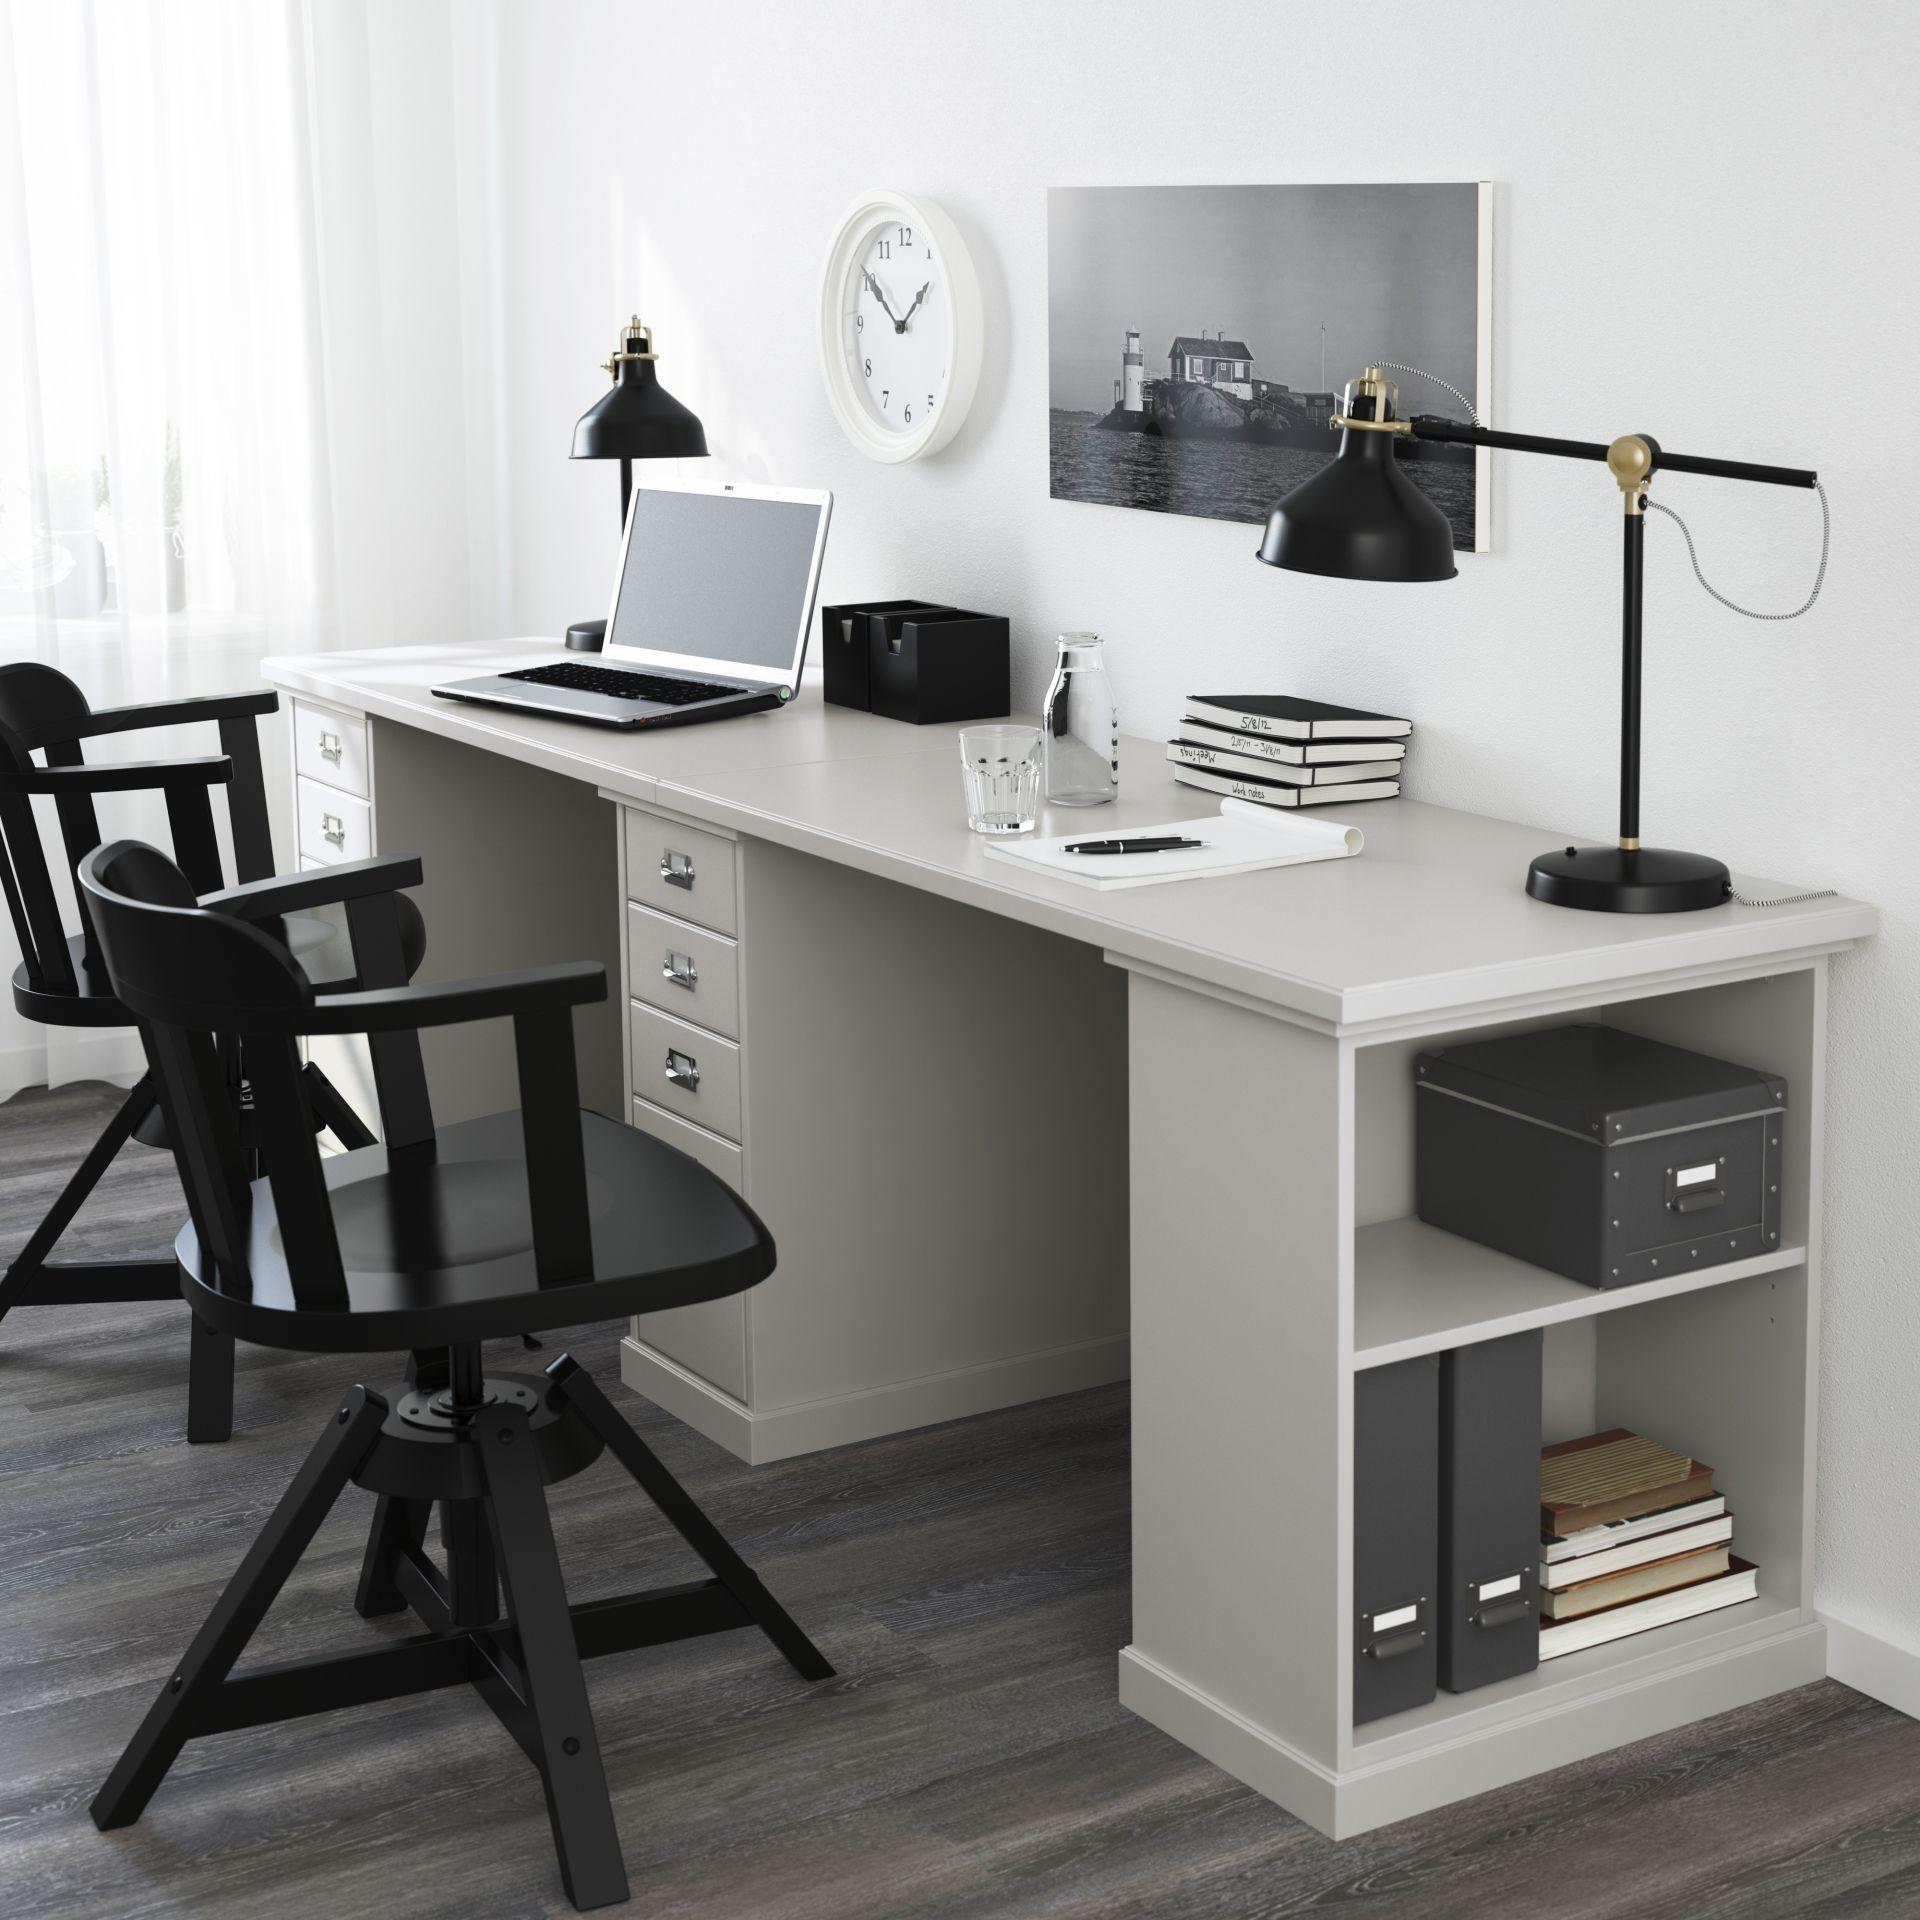 Bureau Tafel Ikea Wit.Klimpen Tafel Grijs Lichtgrijs In 2019 Nieuw Bij Ikea Werkkamer